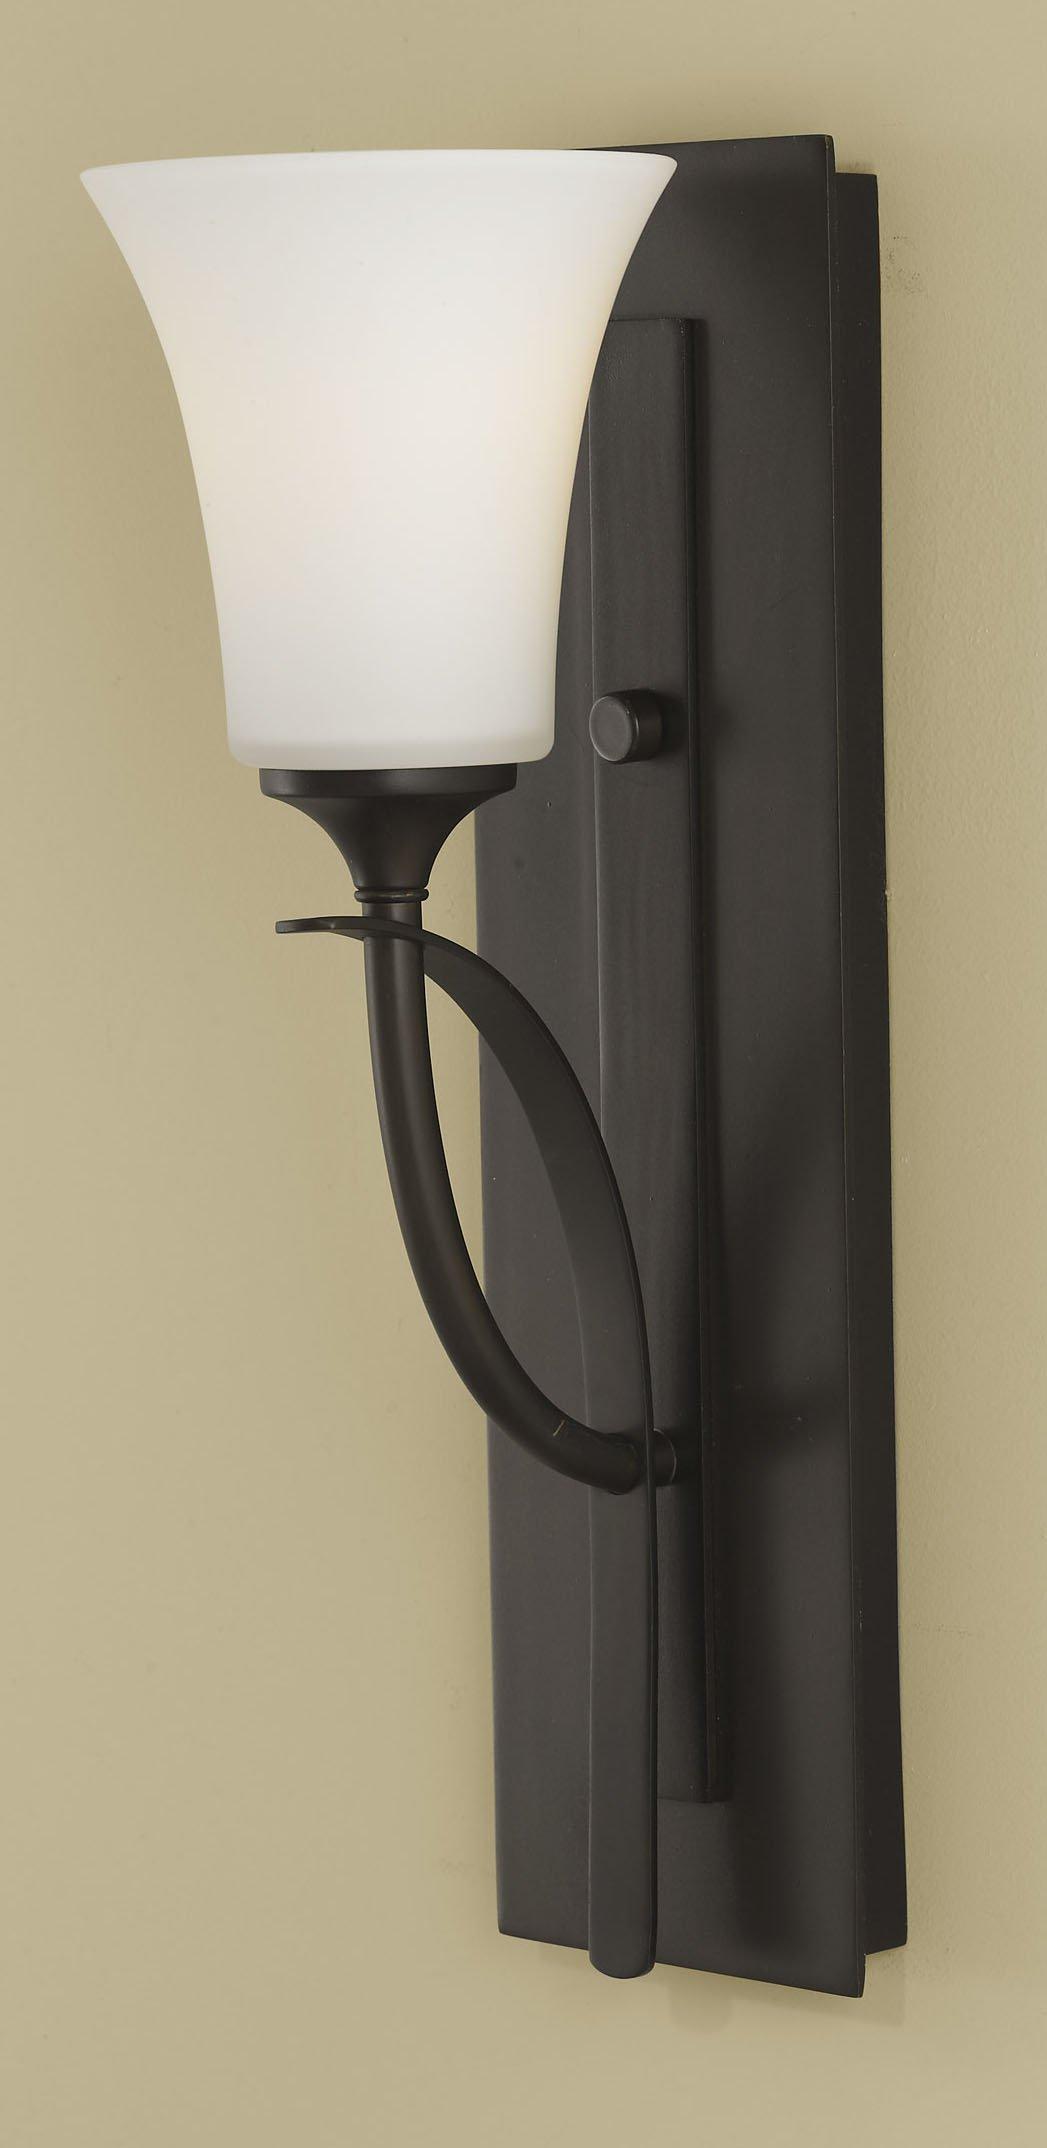 Feiss VS12701-ORB Barrington Glass Wall Sconce Lighting, Bronze, 1-Light (5''W x 16''H) 100watts